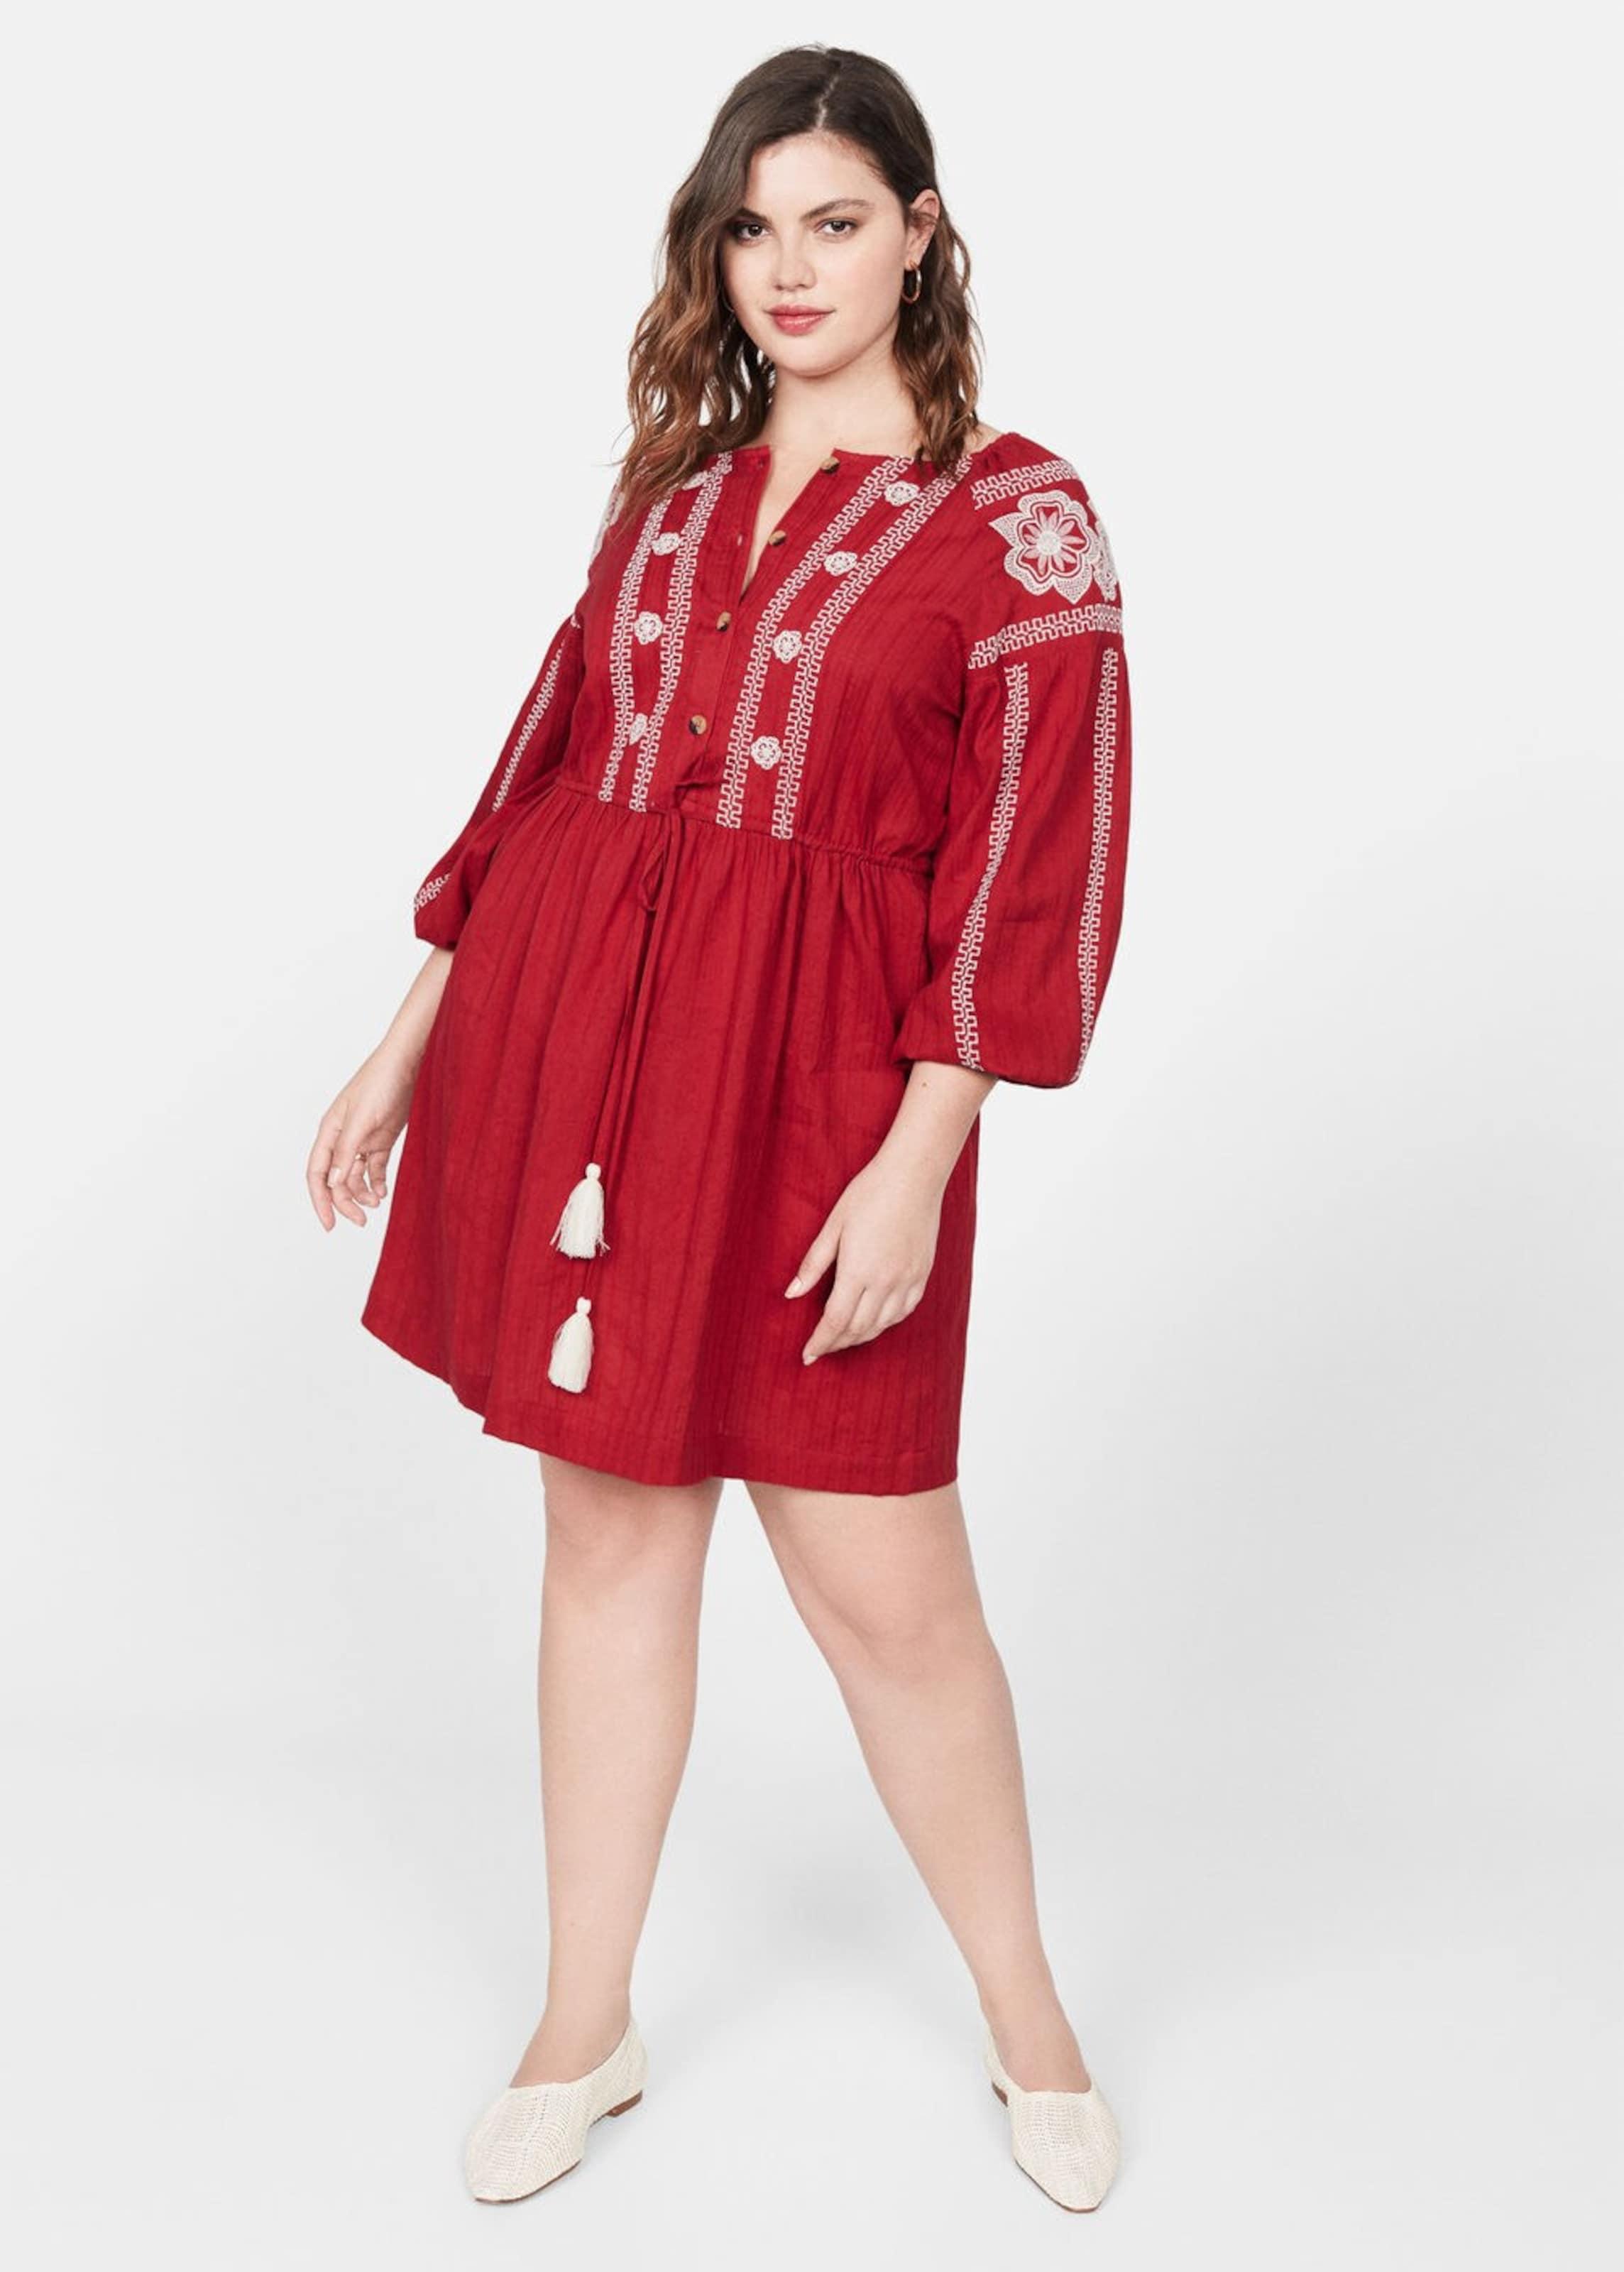 Mango Kleid In Rot 'bordado Violeta By i' CxBdroe